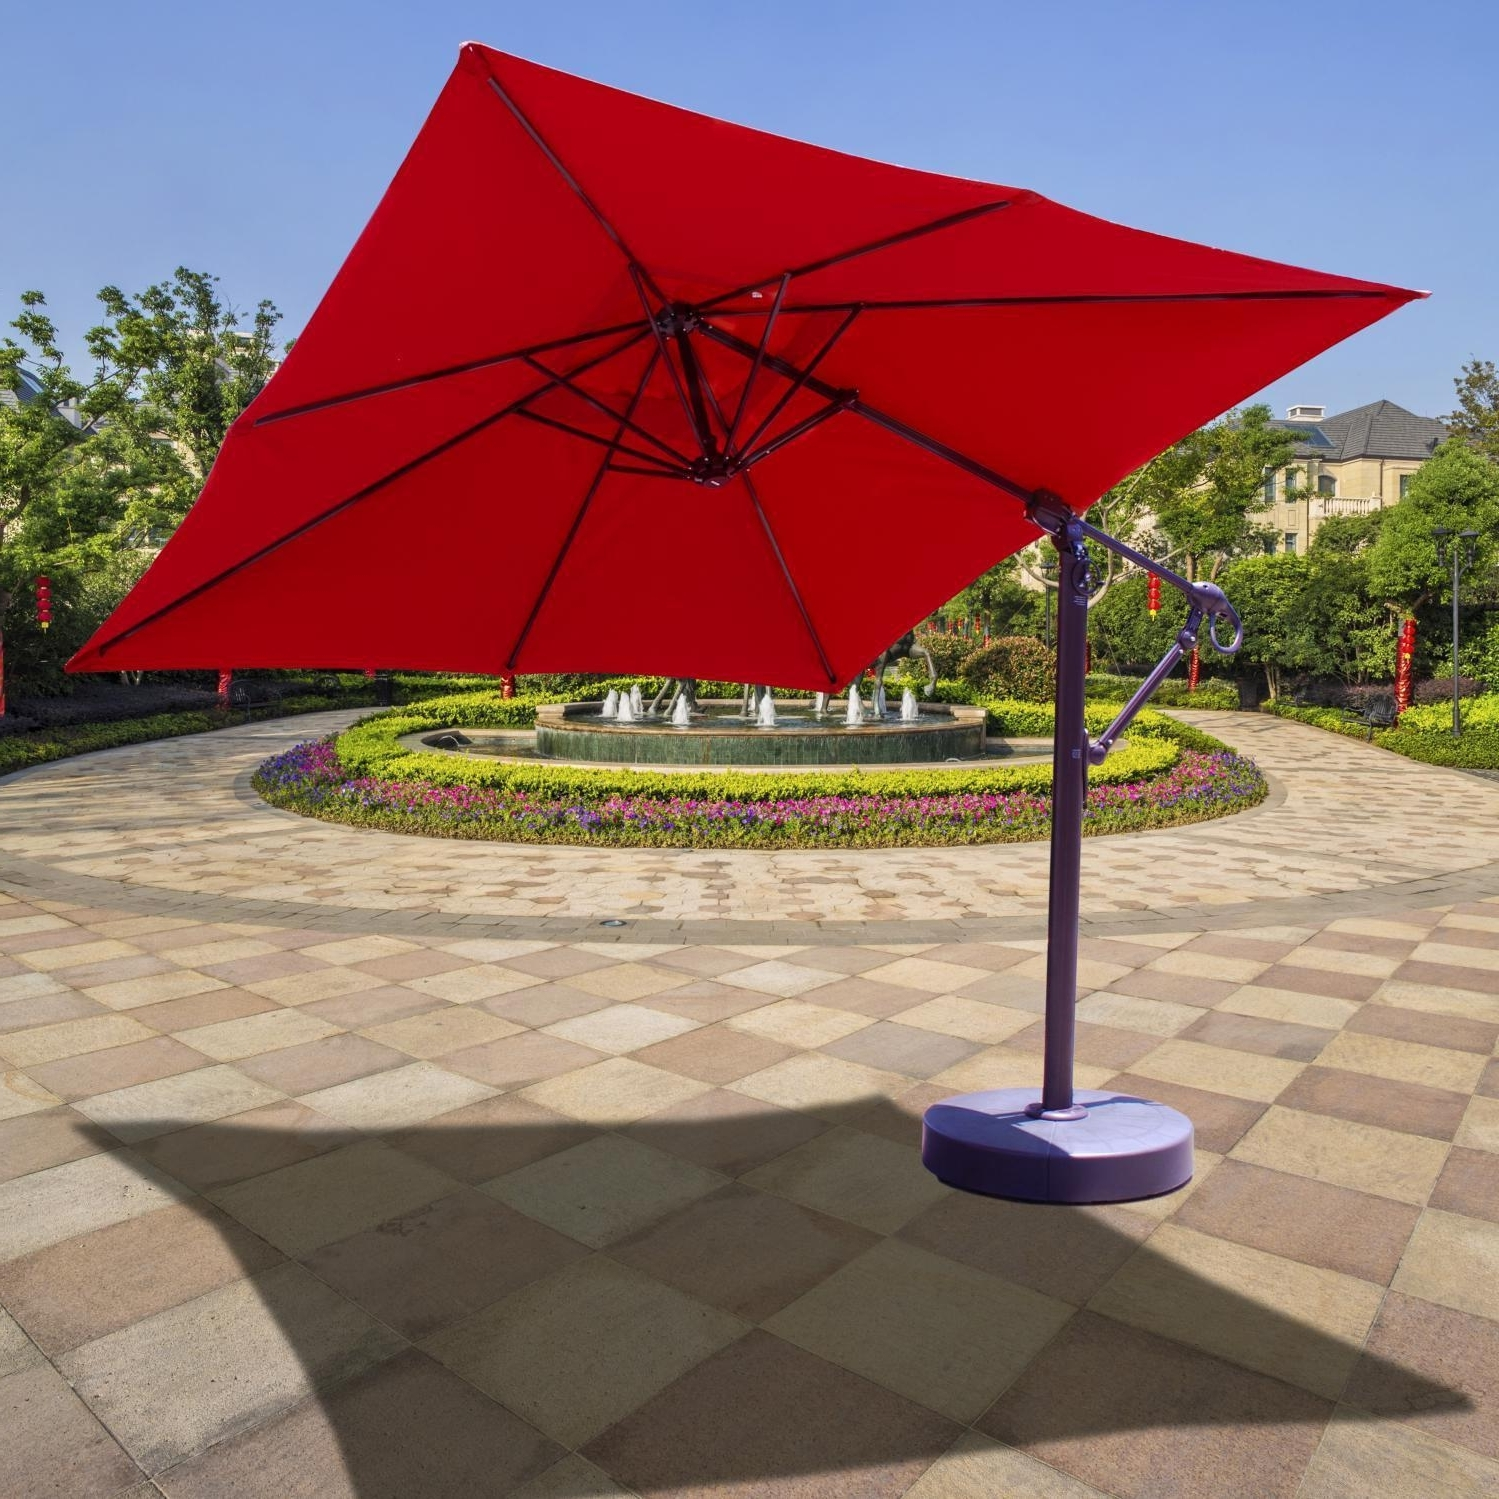 Cantilever Patio Umbrellas With Regard To 2018 Galtech 10 Ft Aluminum Square Cantilever Patio Umbrella With Easy (View 14 of 20)